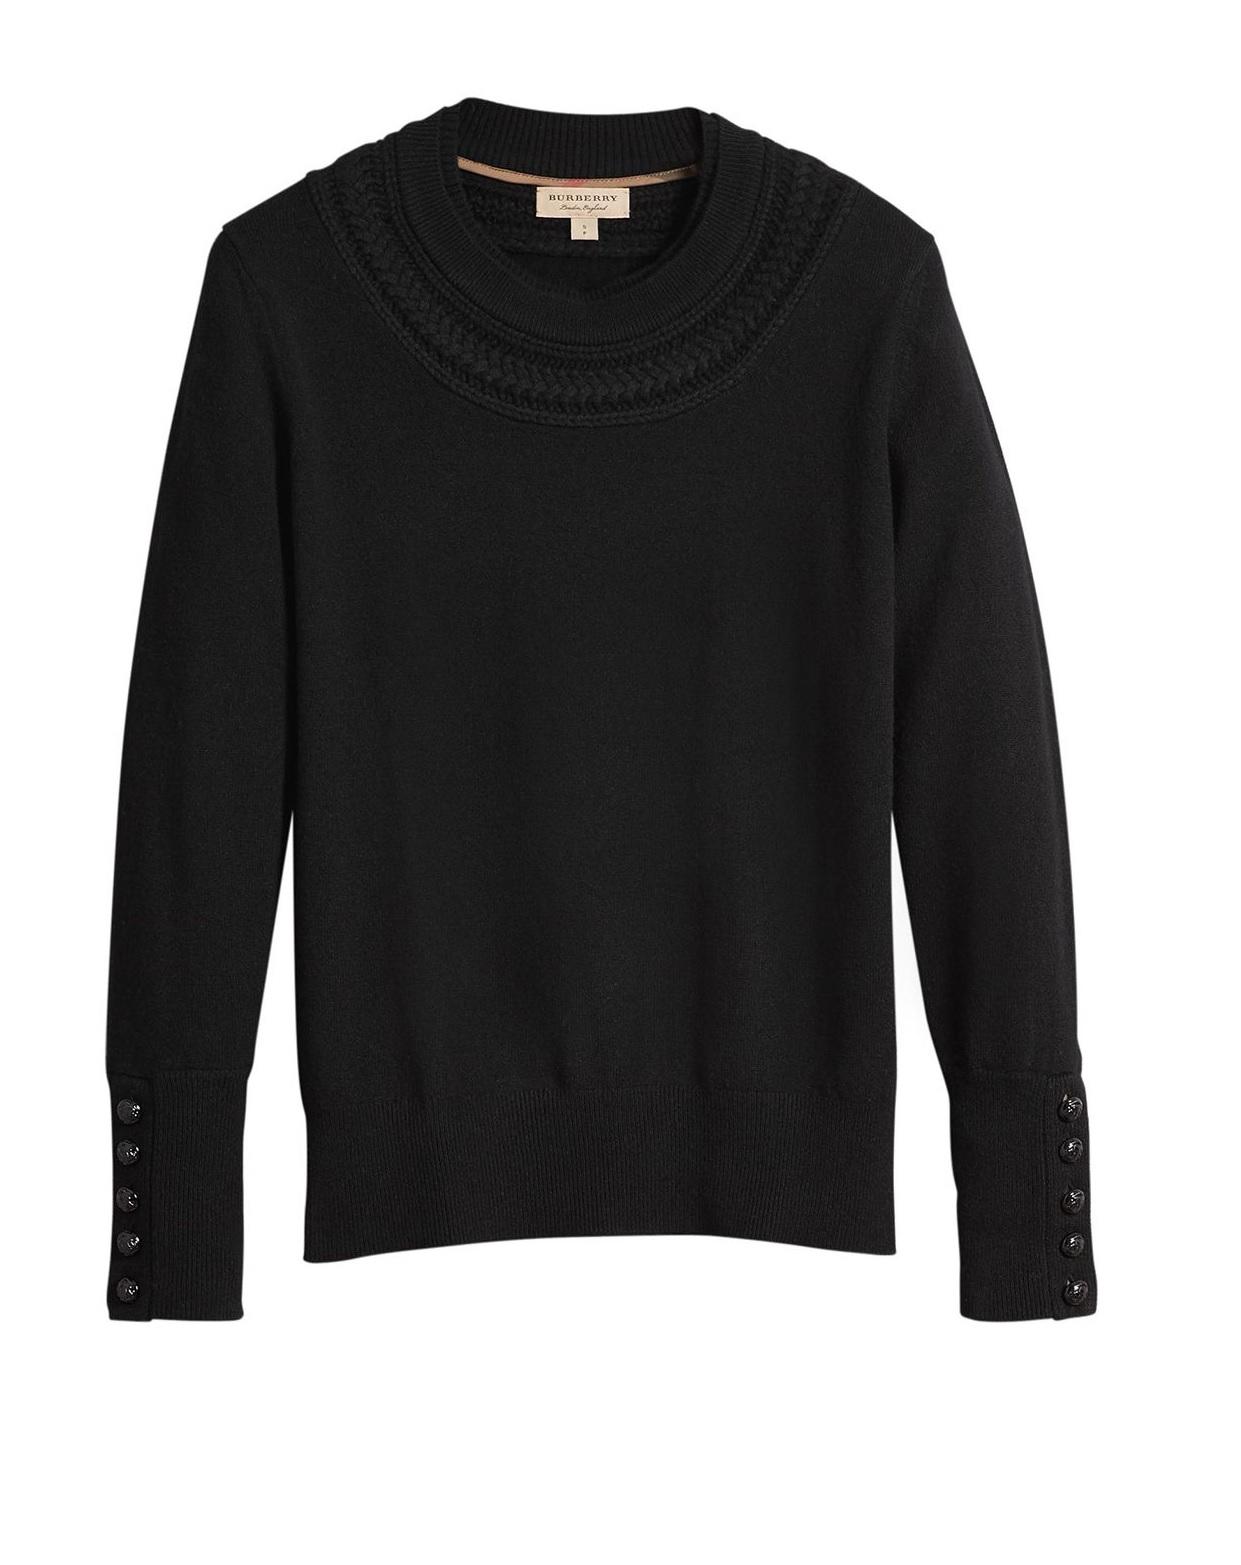 Burberry Ladies Black Cashmere Sweater